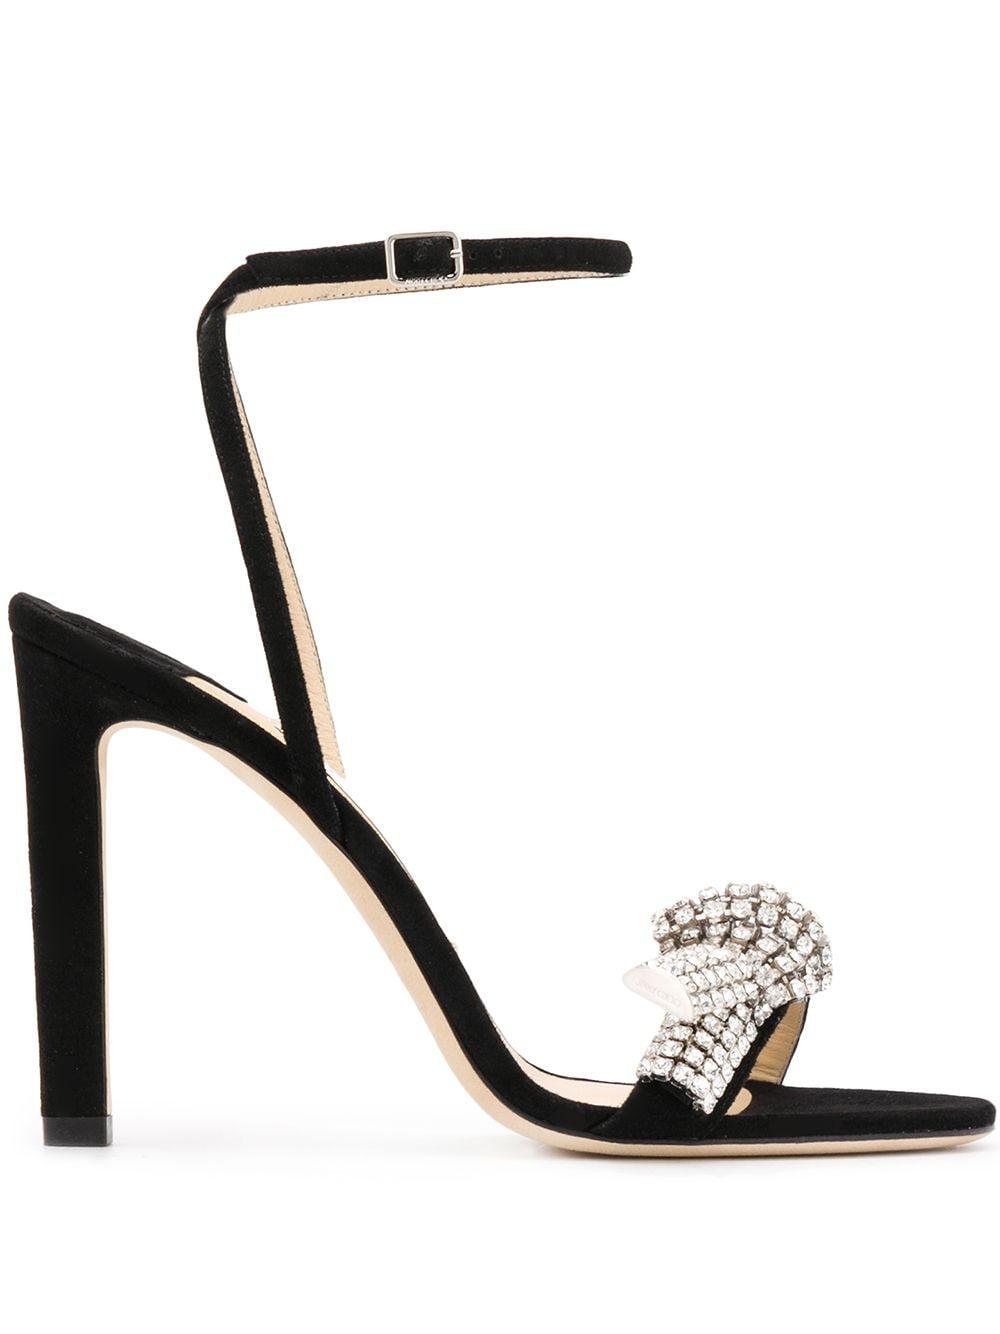 Thyra Leather Sandals